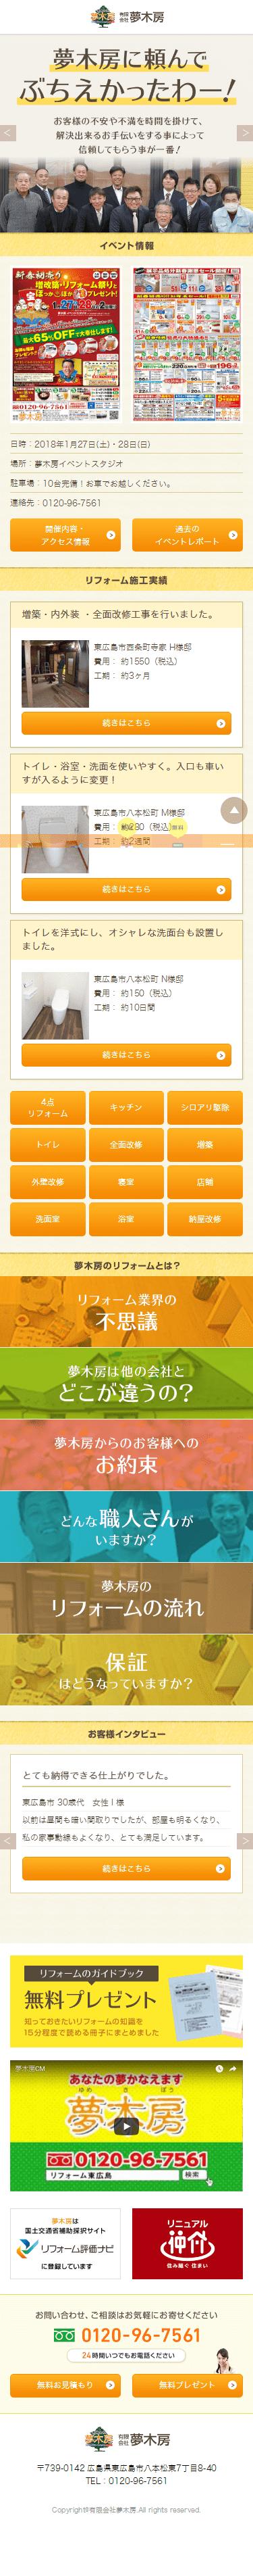 広島県 有限会社 夢木房様 ホームページ制作3